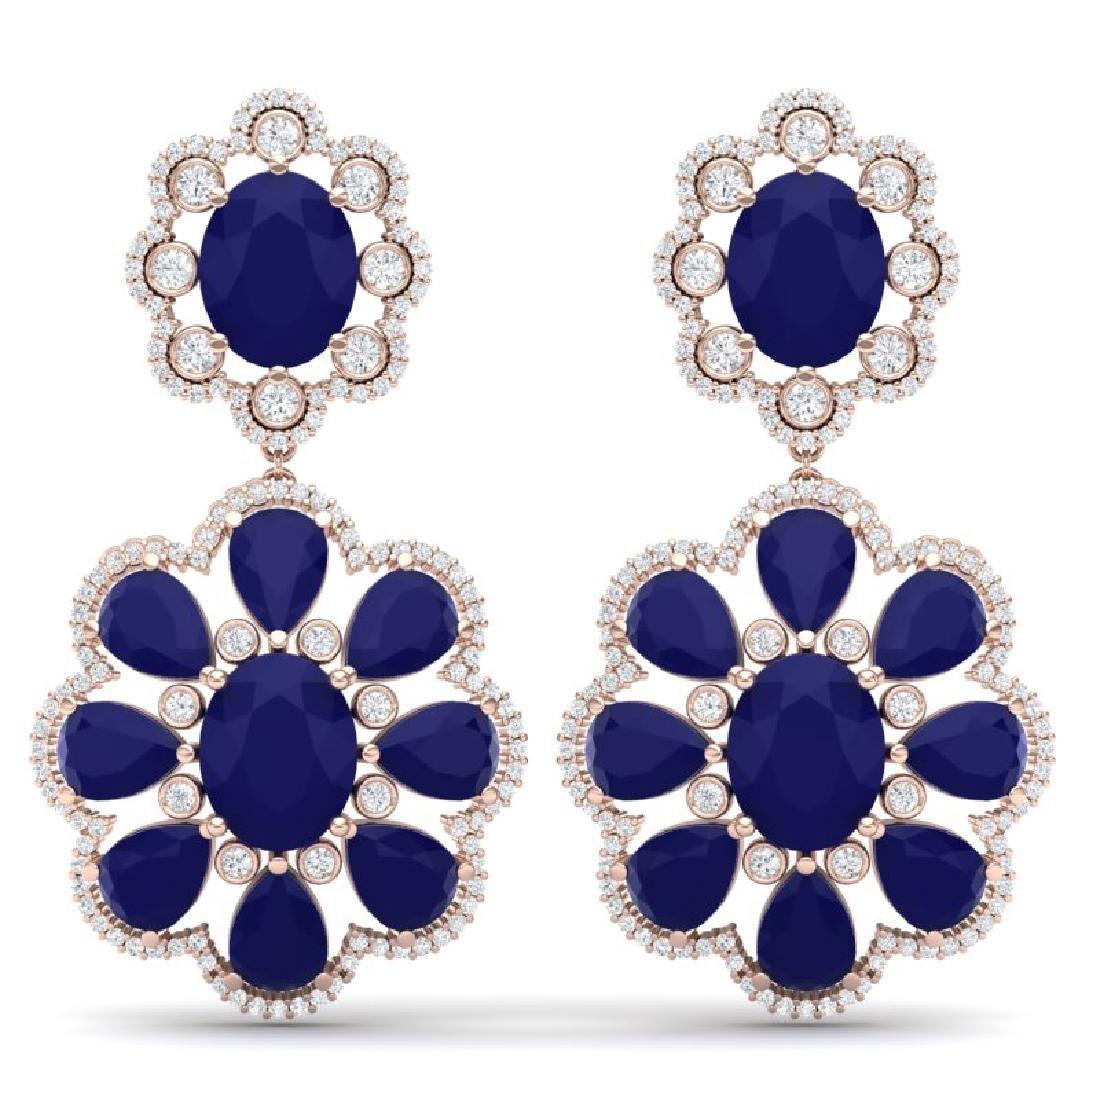 33.88 CTW Royalty Sapphire & VS Diamond Earrings 18K